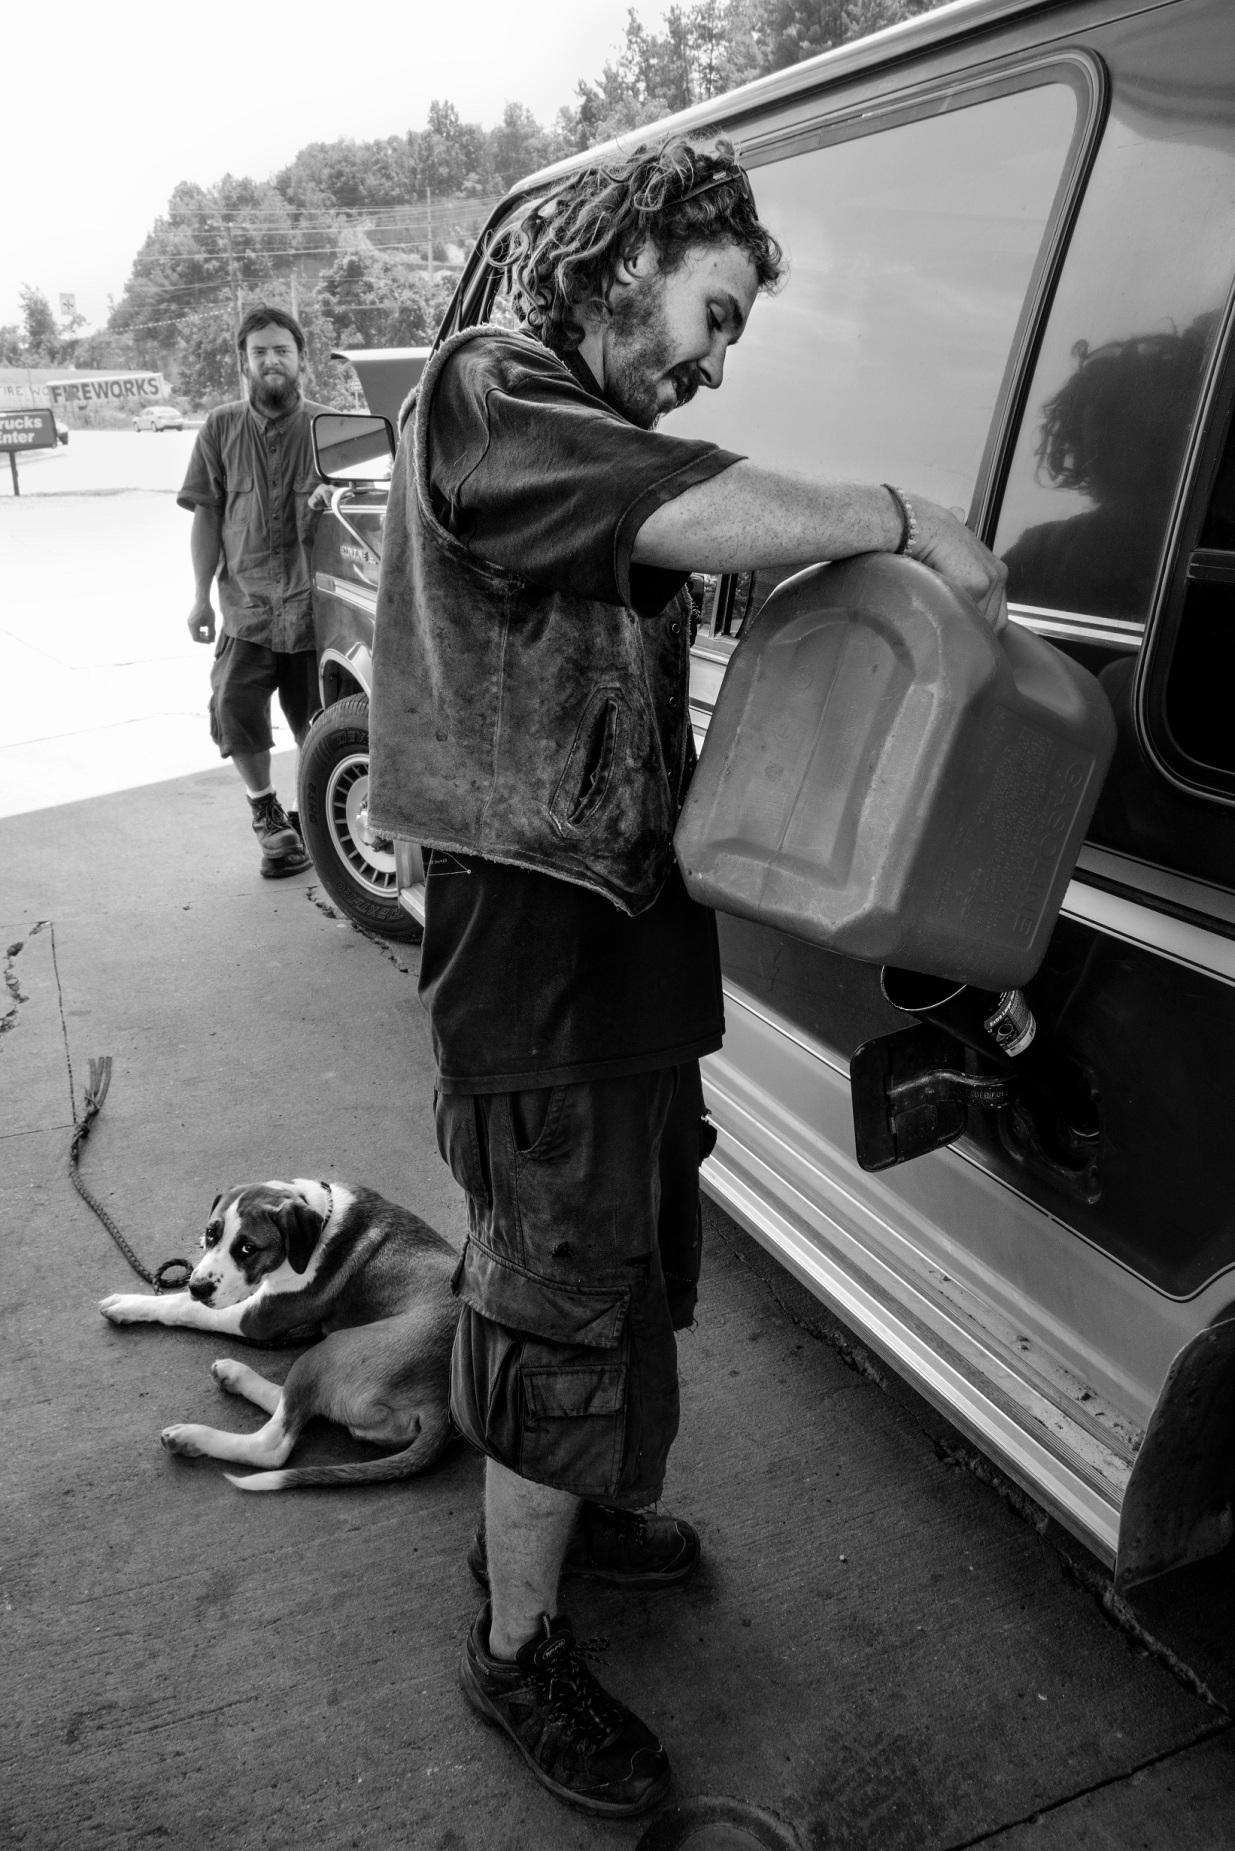 gas-panhandler-2016-daniel-d-teoli-jr